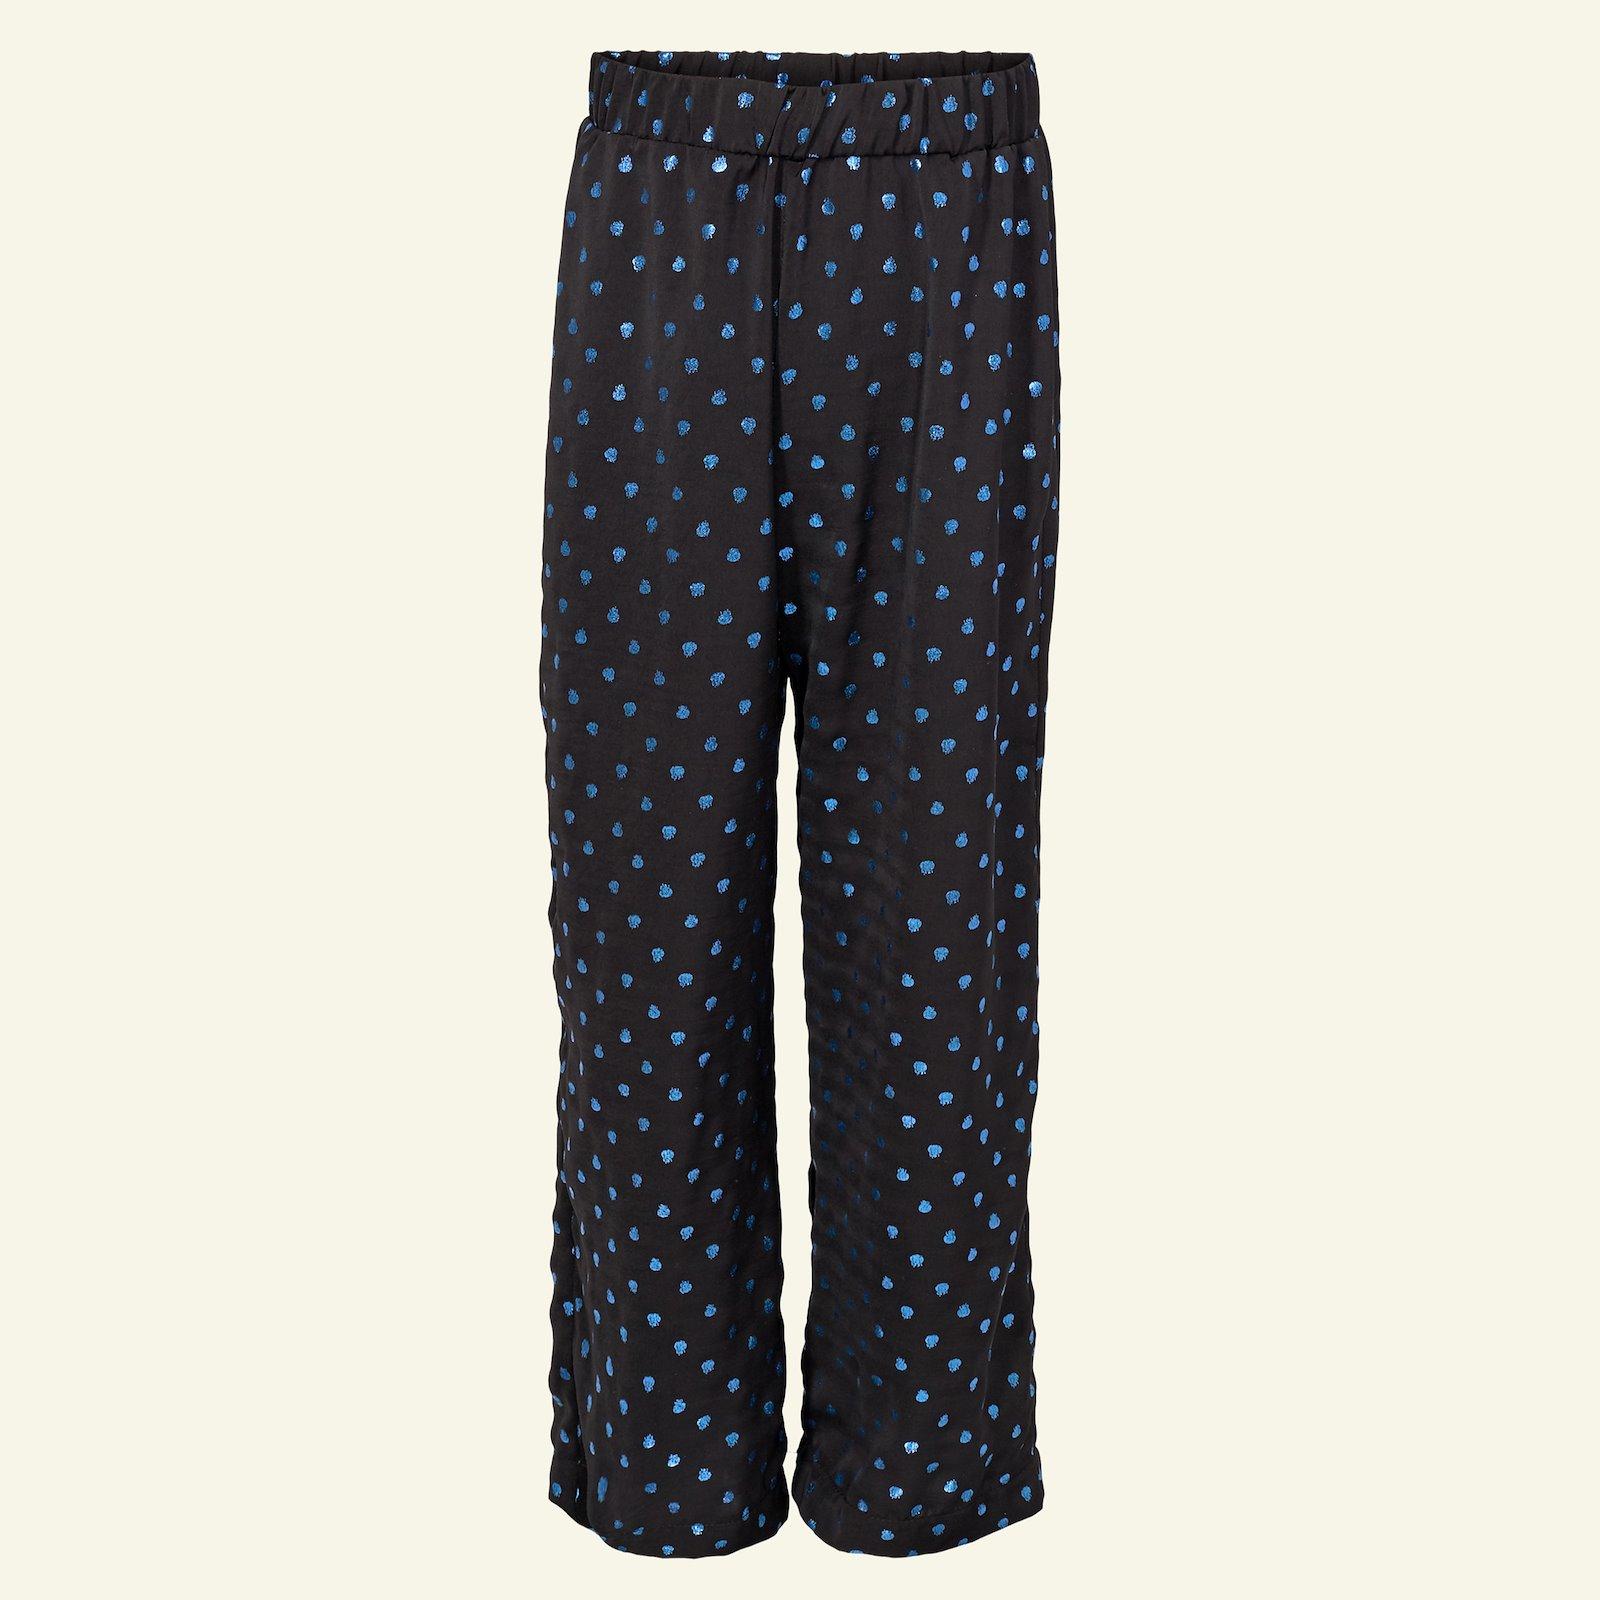 High waist and wide lege trouser, 140/10 p60034_570100_sskit